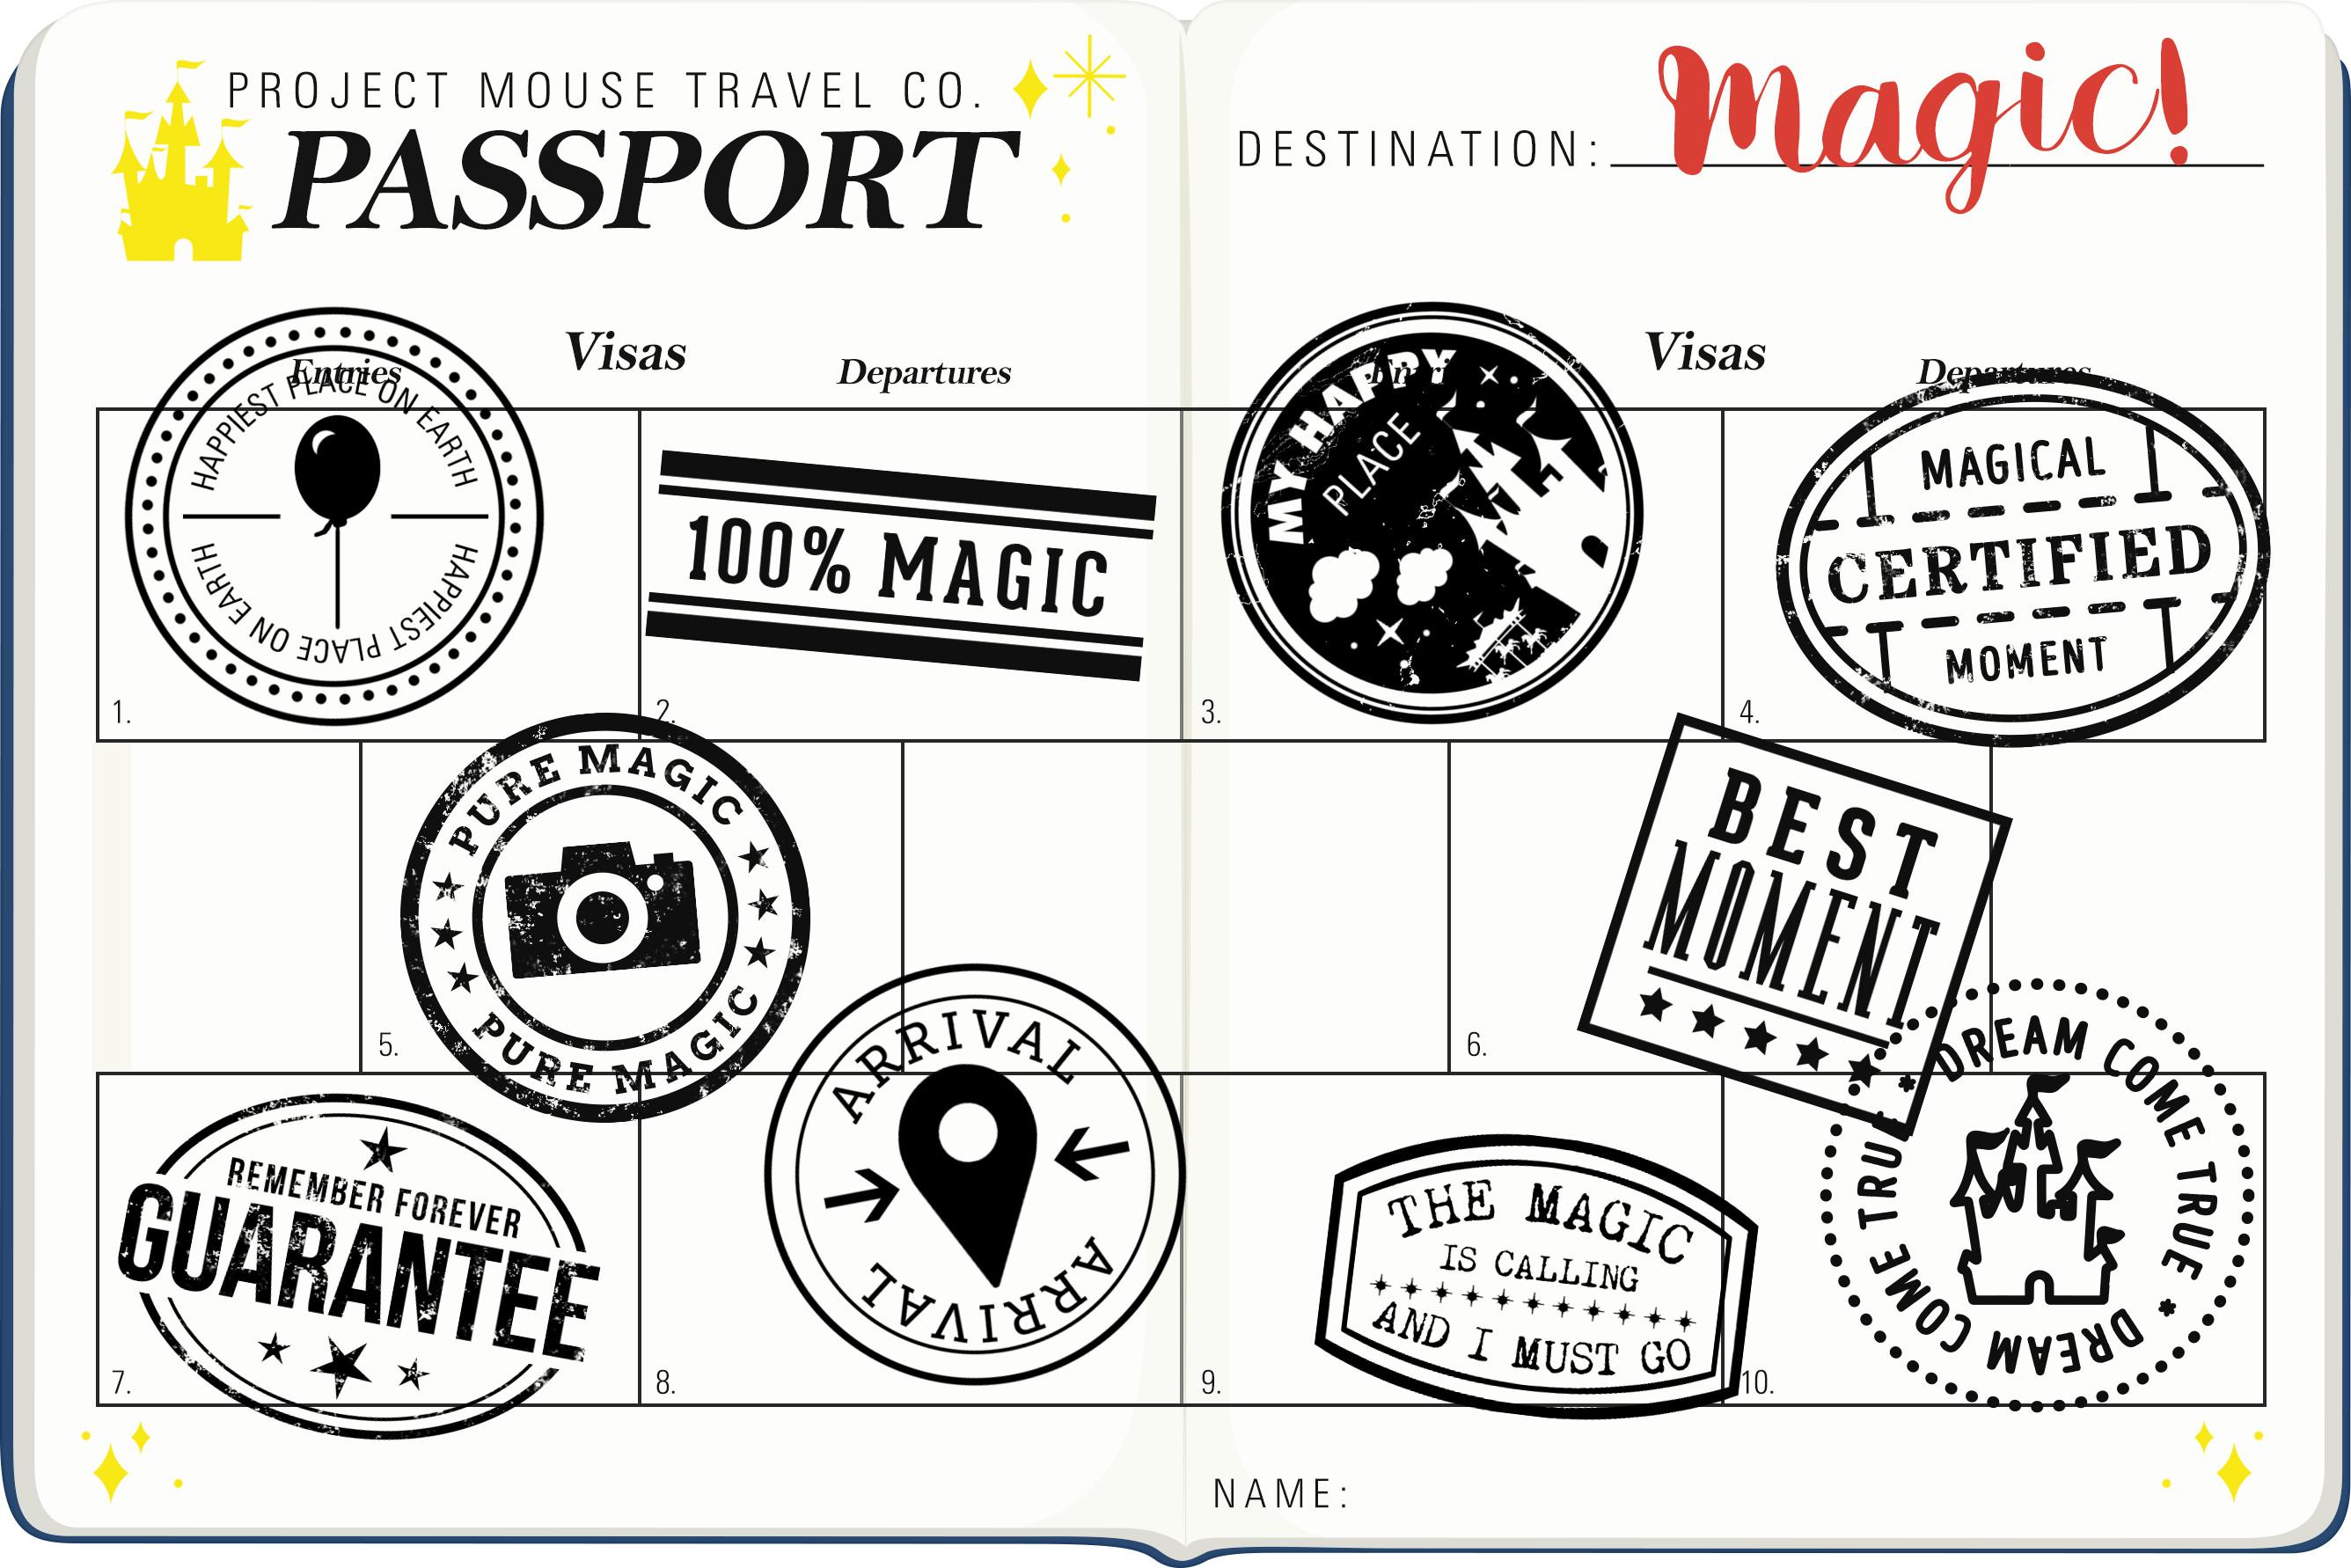 corsicar-pm-passport.jpg